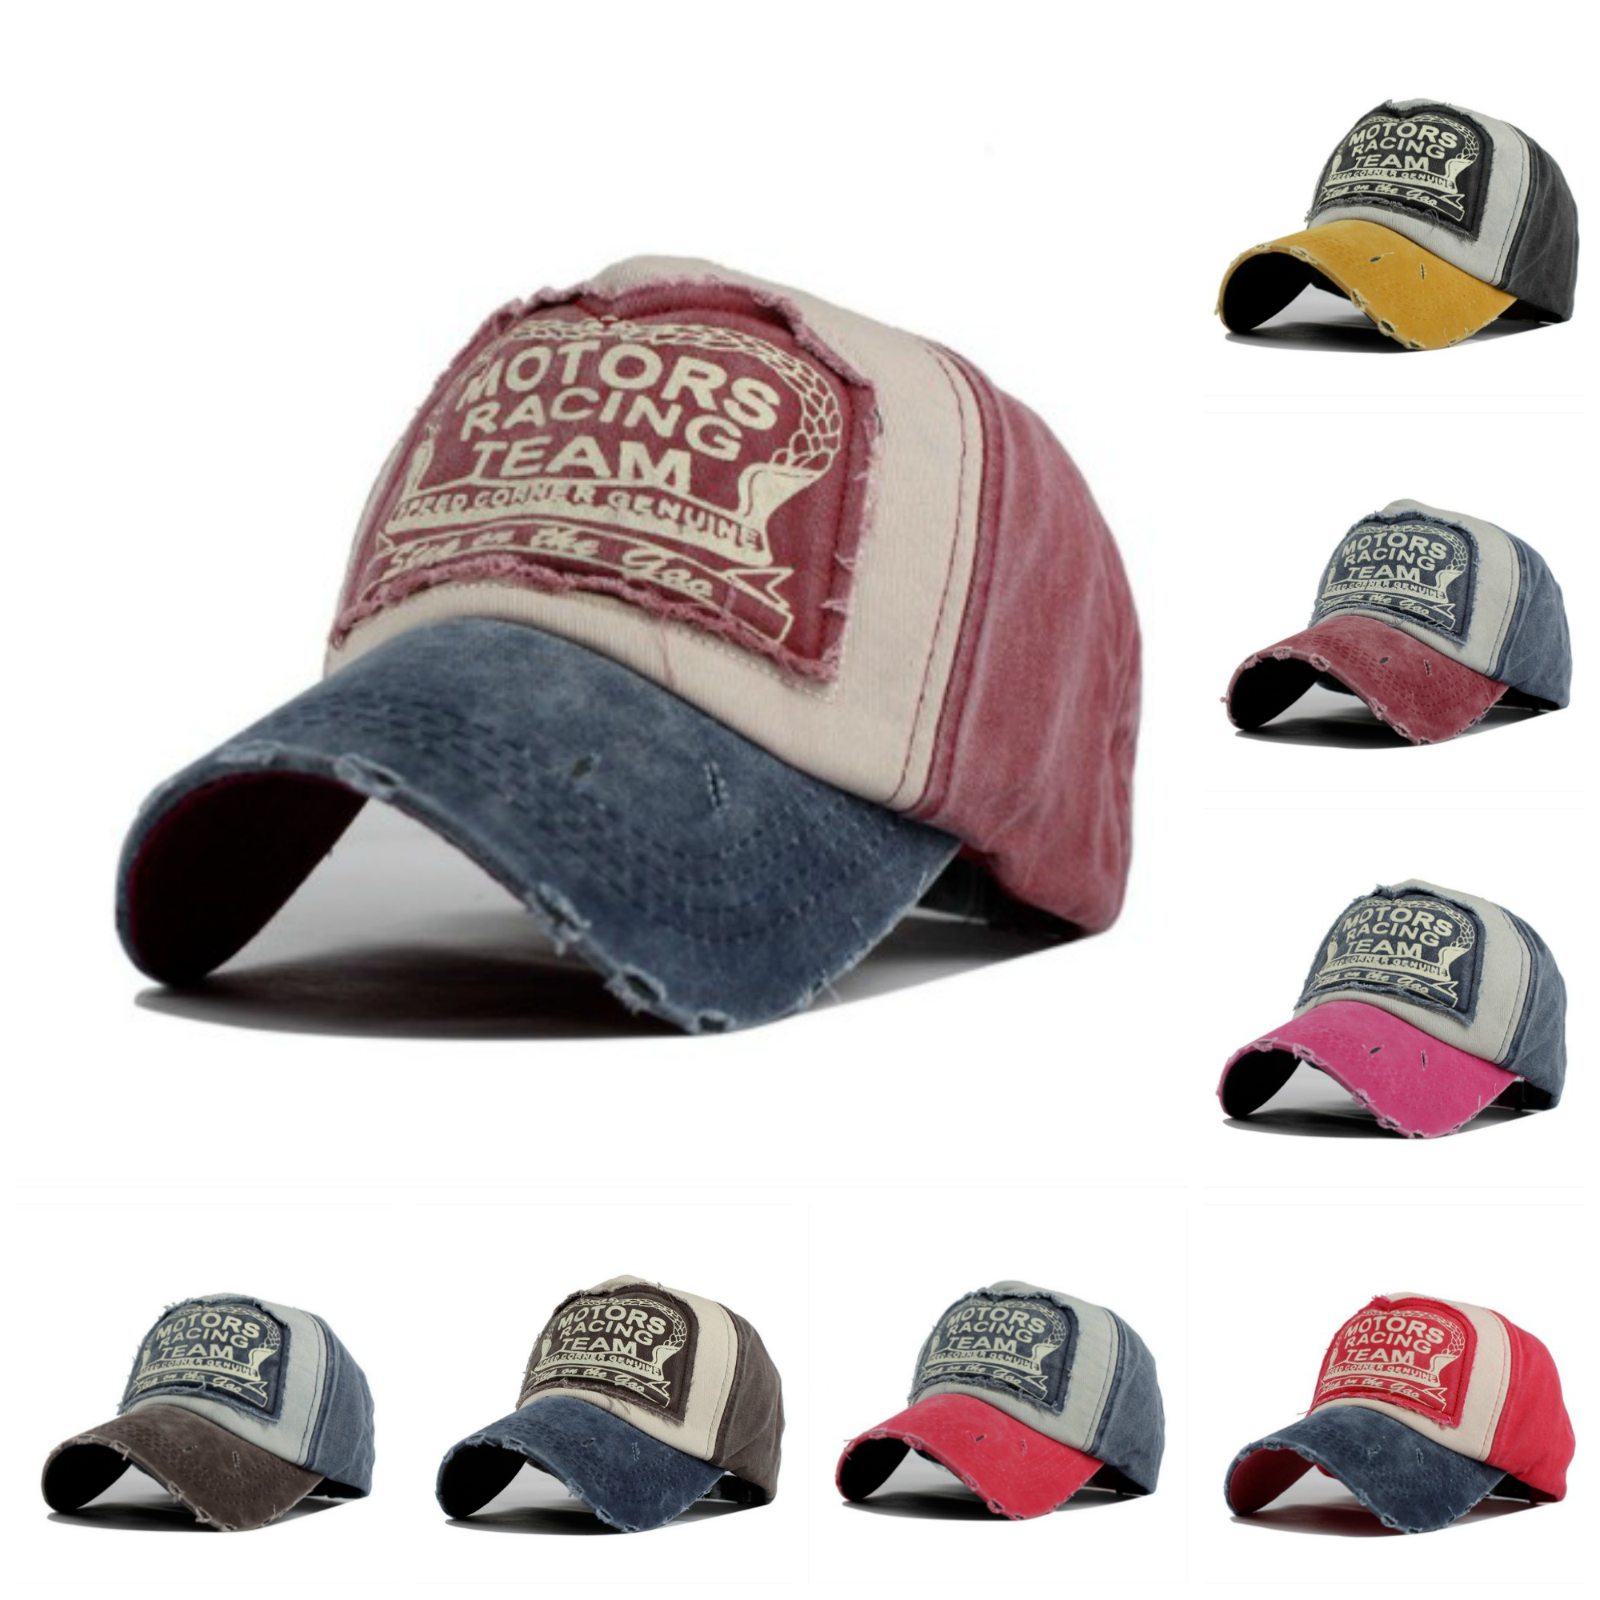 24885e10 Details about Summer Baseball Cap Trucker Adjustable Snapback Vintage  Cotton Hat Men Women USA